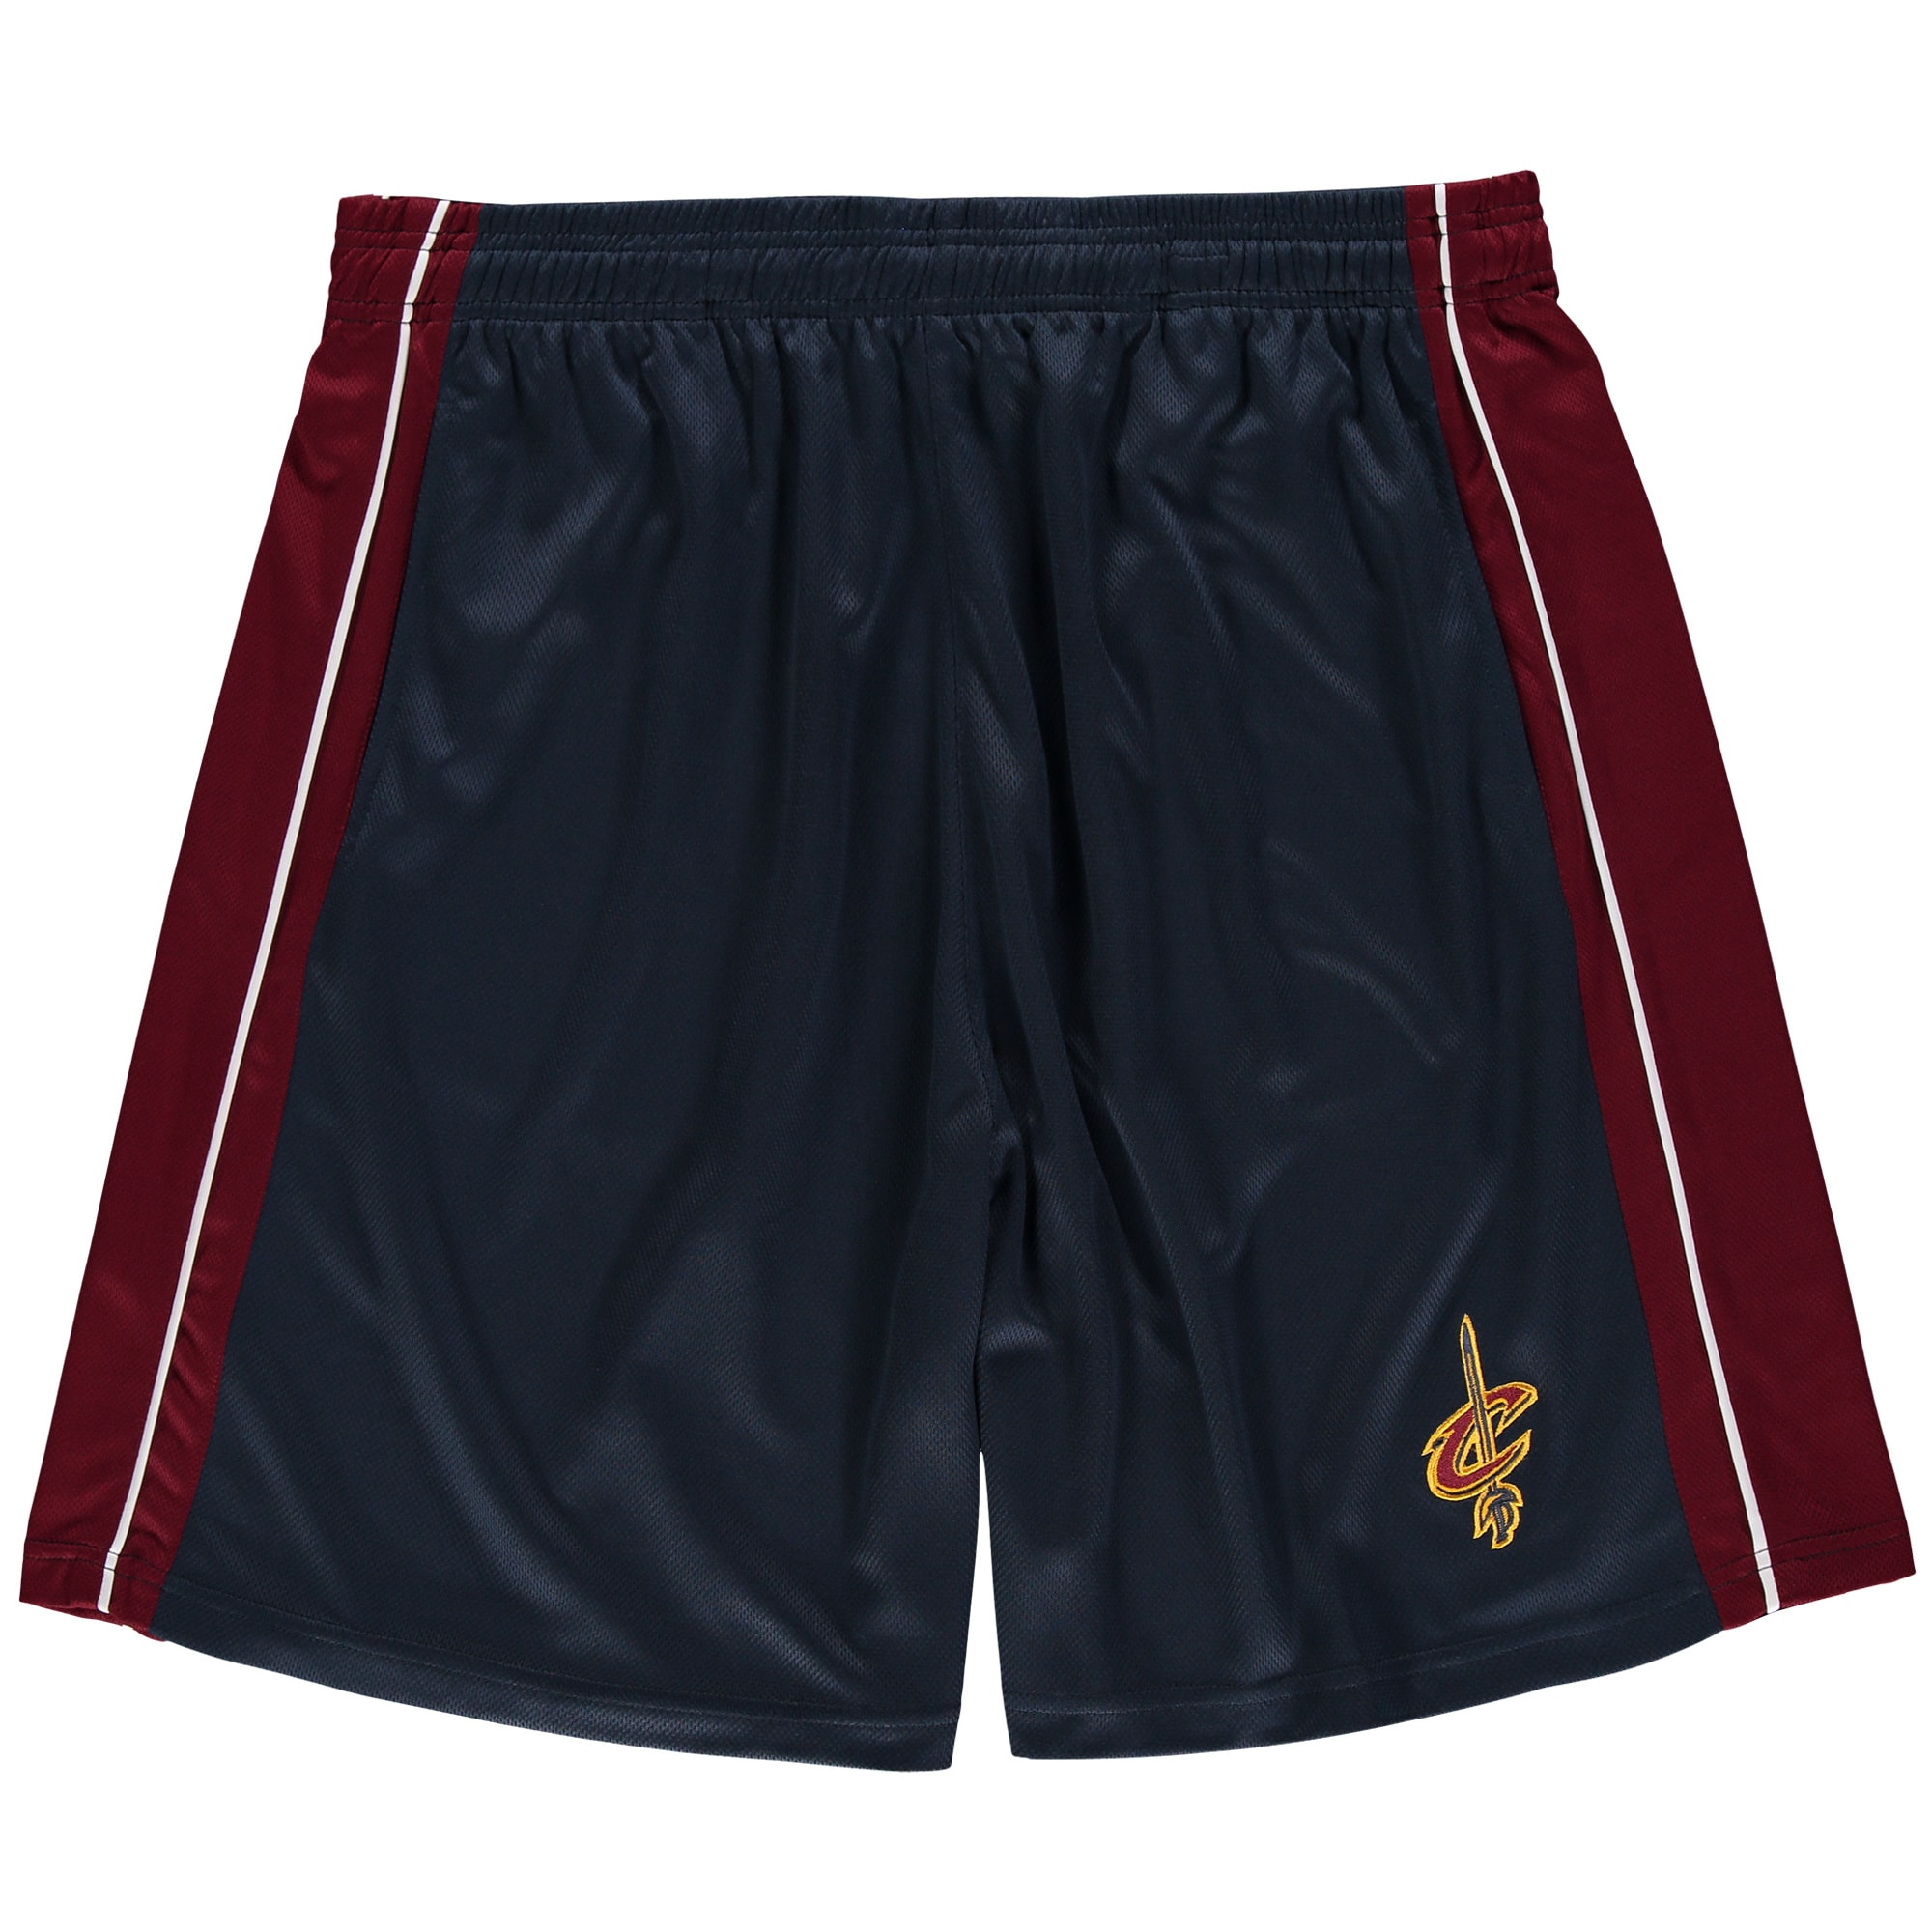 Cleveland Cavaliers Majestic Big & Tall Birdseye Shorts - Navy/Wine